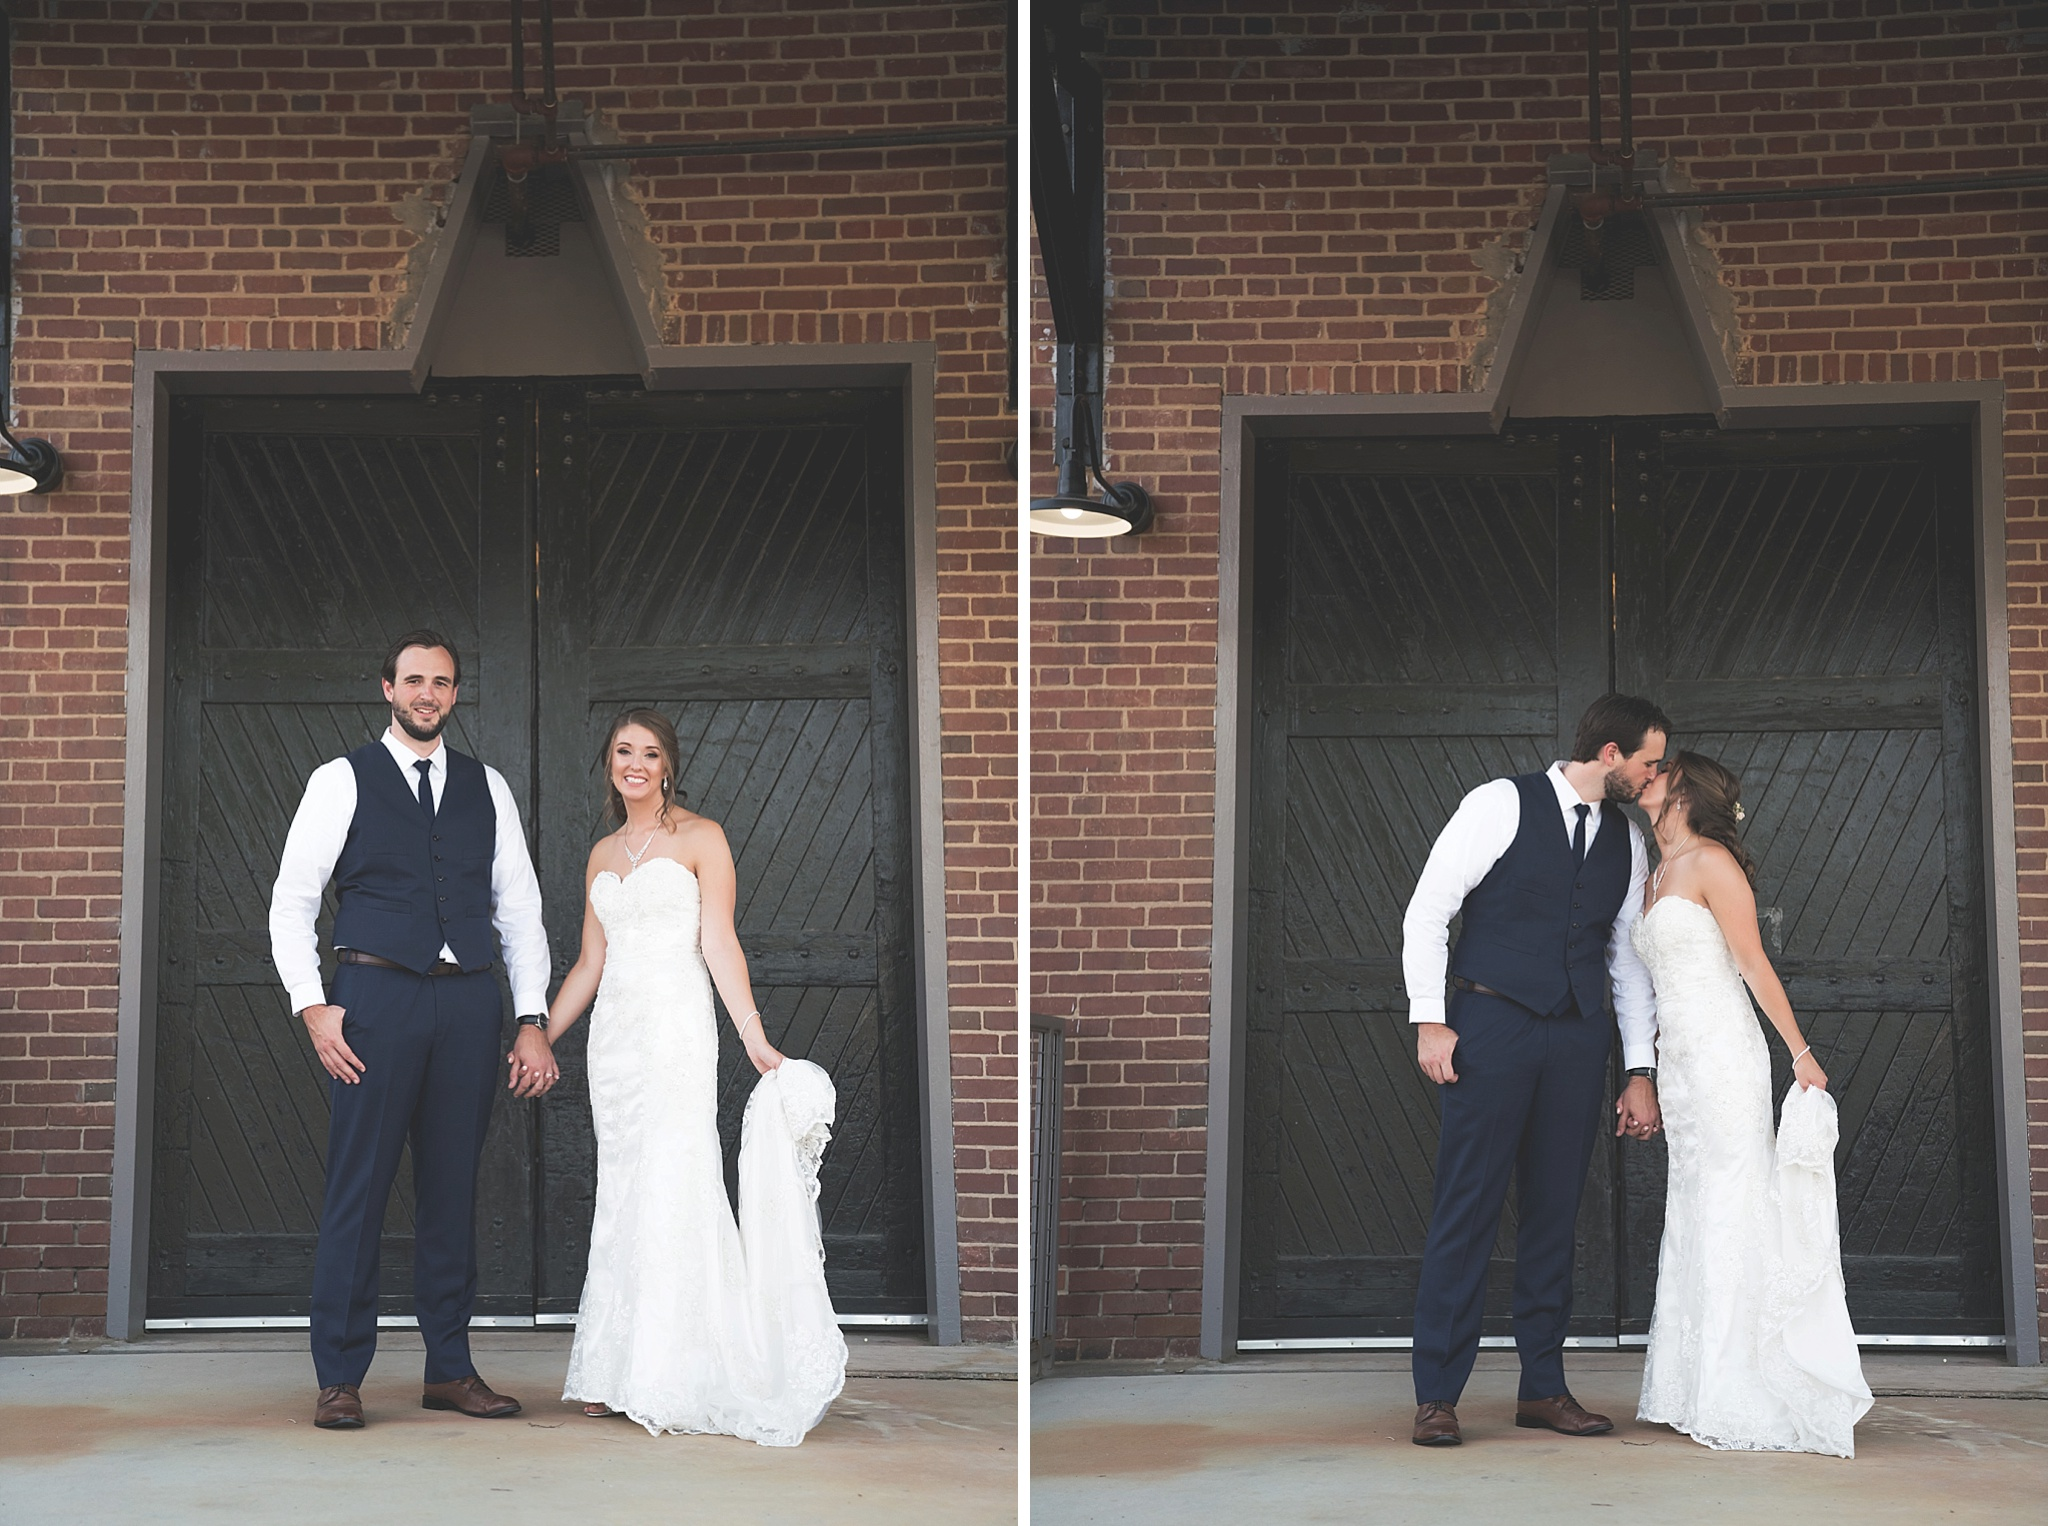 Rickhouse-Durham-NC-Wedding-Photographer-056.jpg